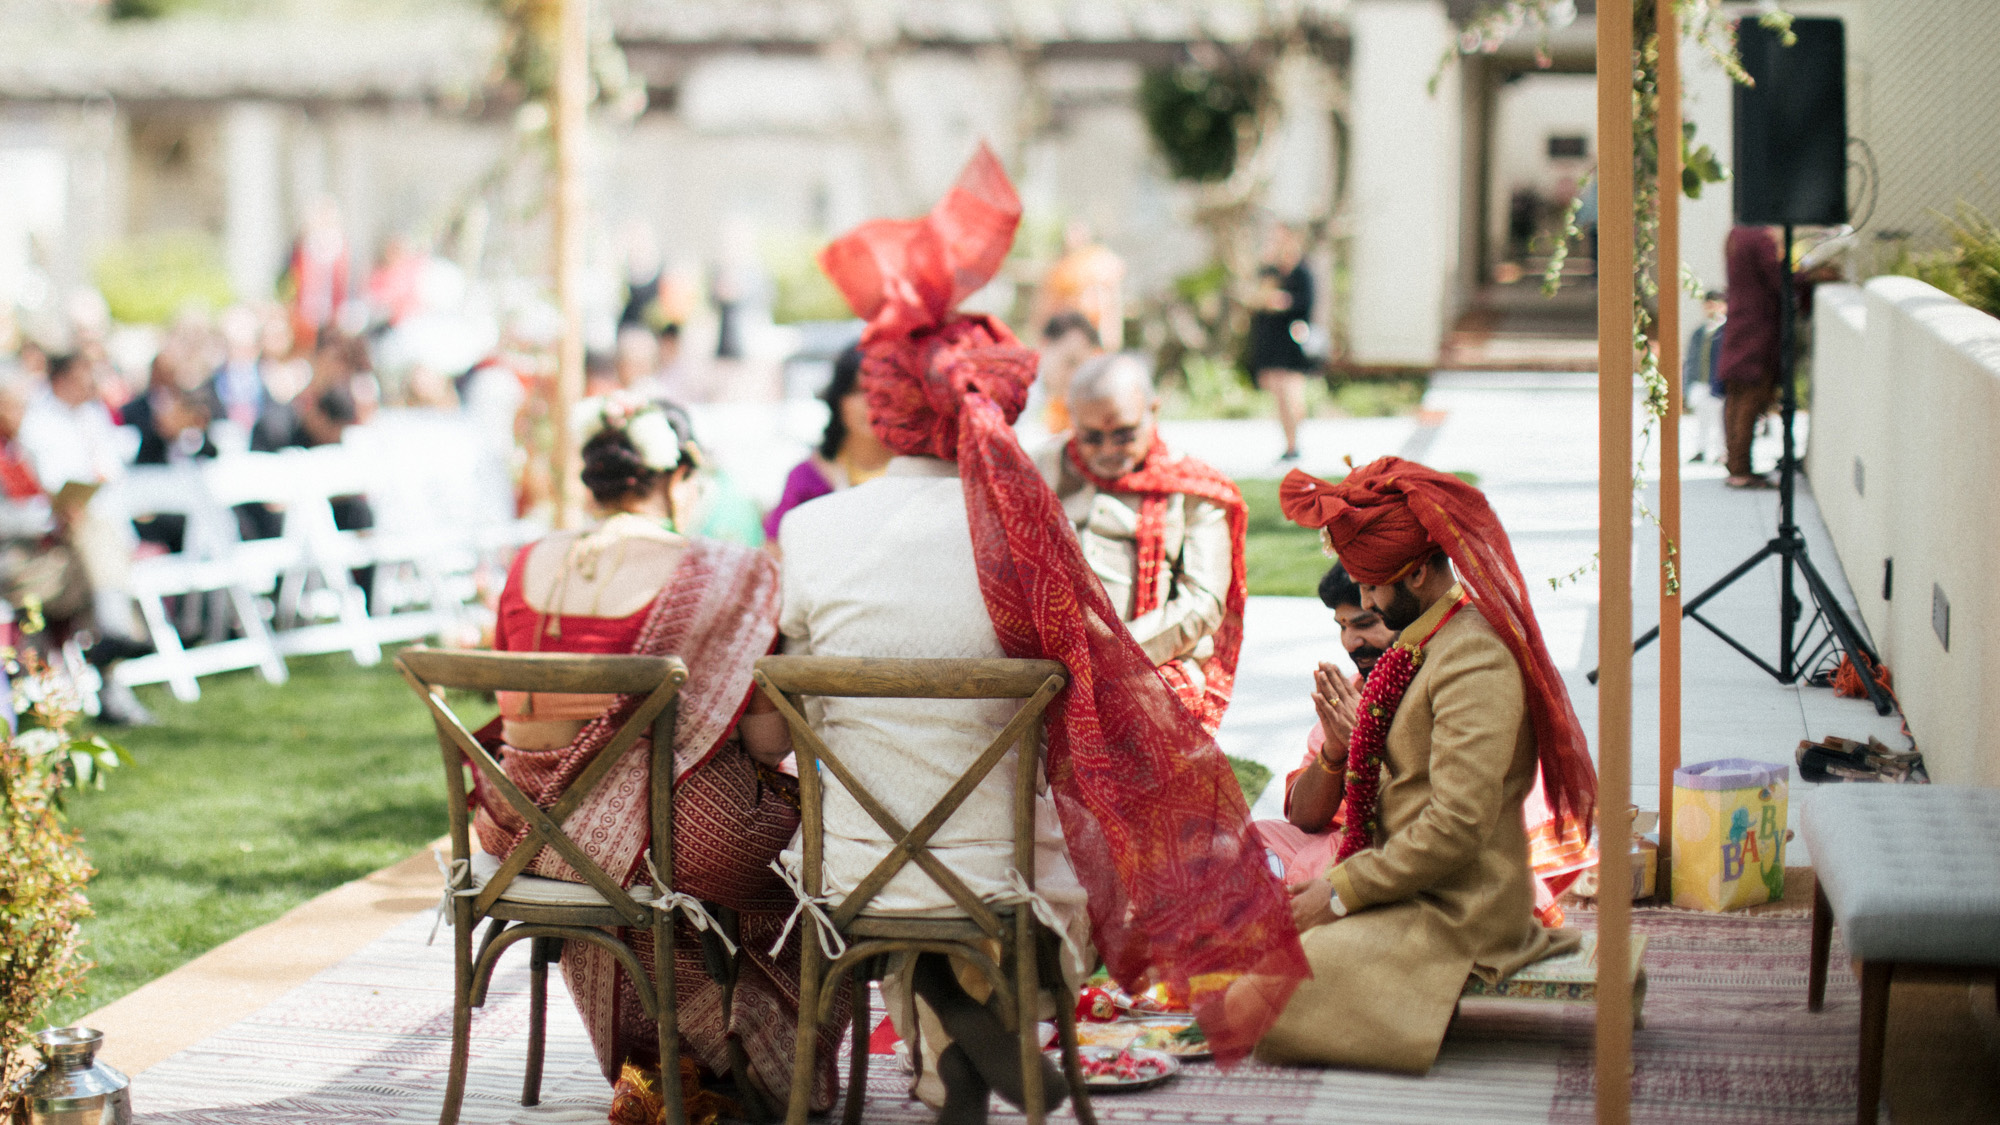 anu_maneesh_alec_vanderboom_Indian_wedding_photography-0092.jpg